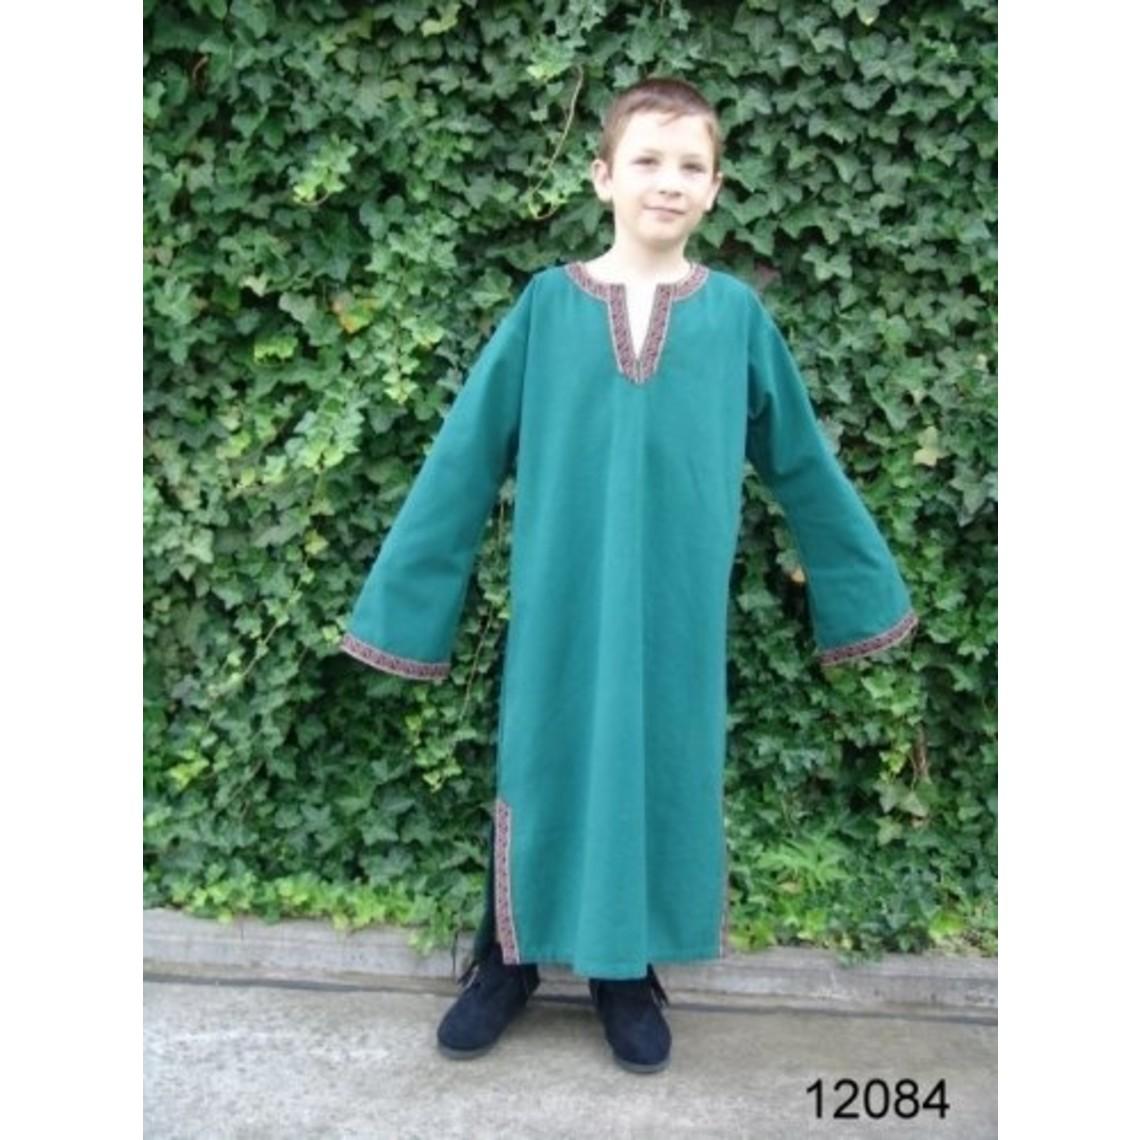 Leonardo Carbone Keltische jongenstuniek Finn groen